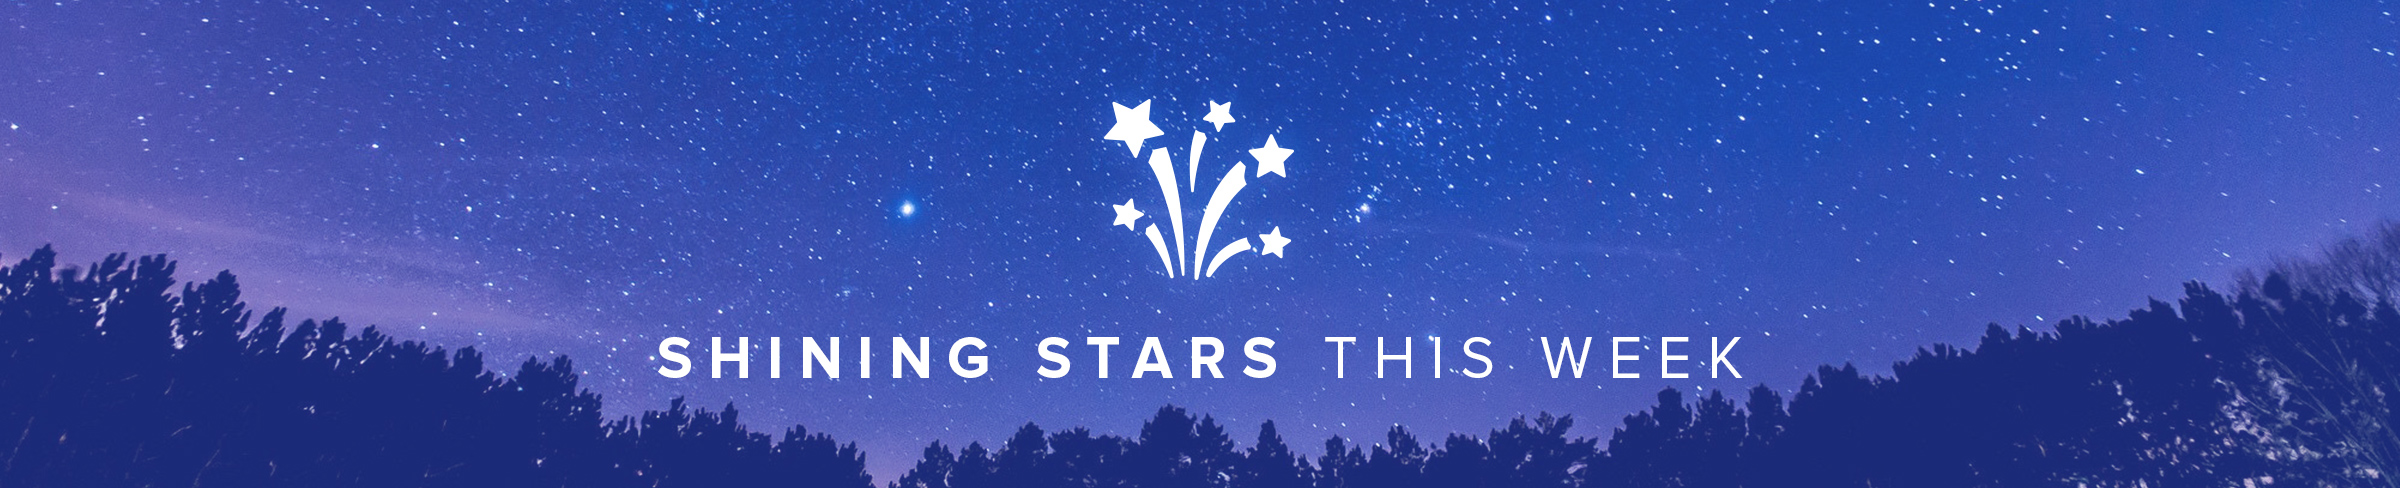 Shining Stars This Week